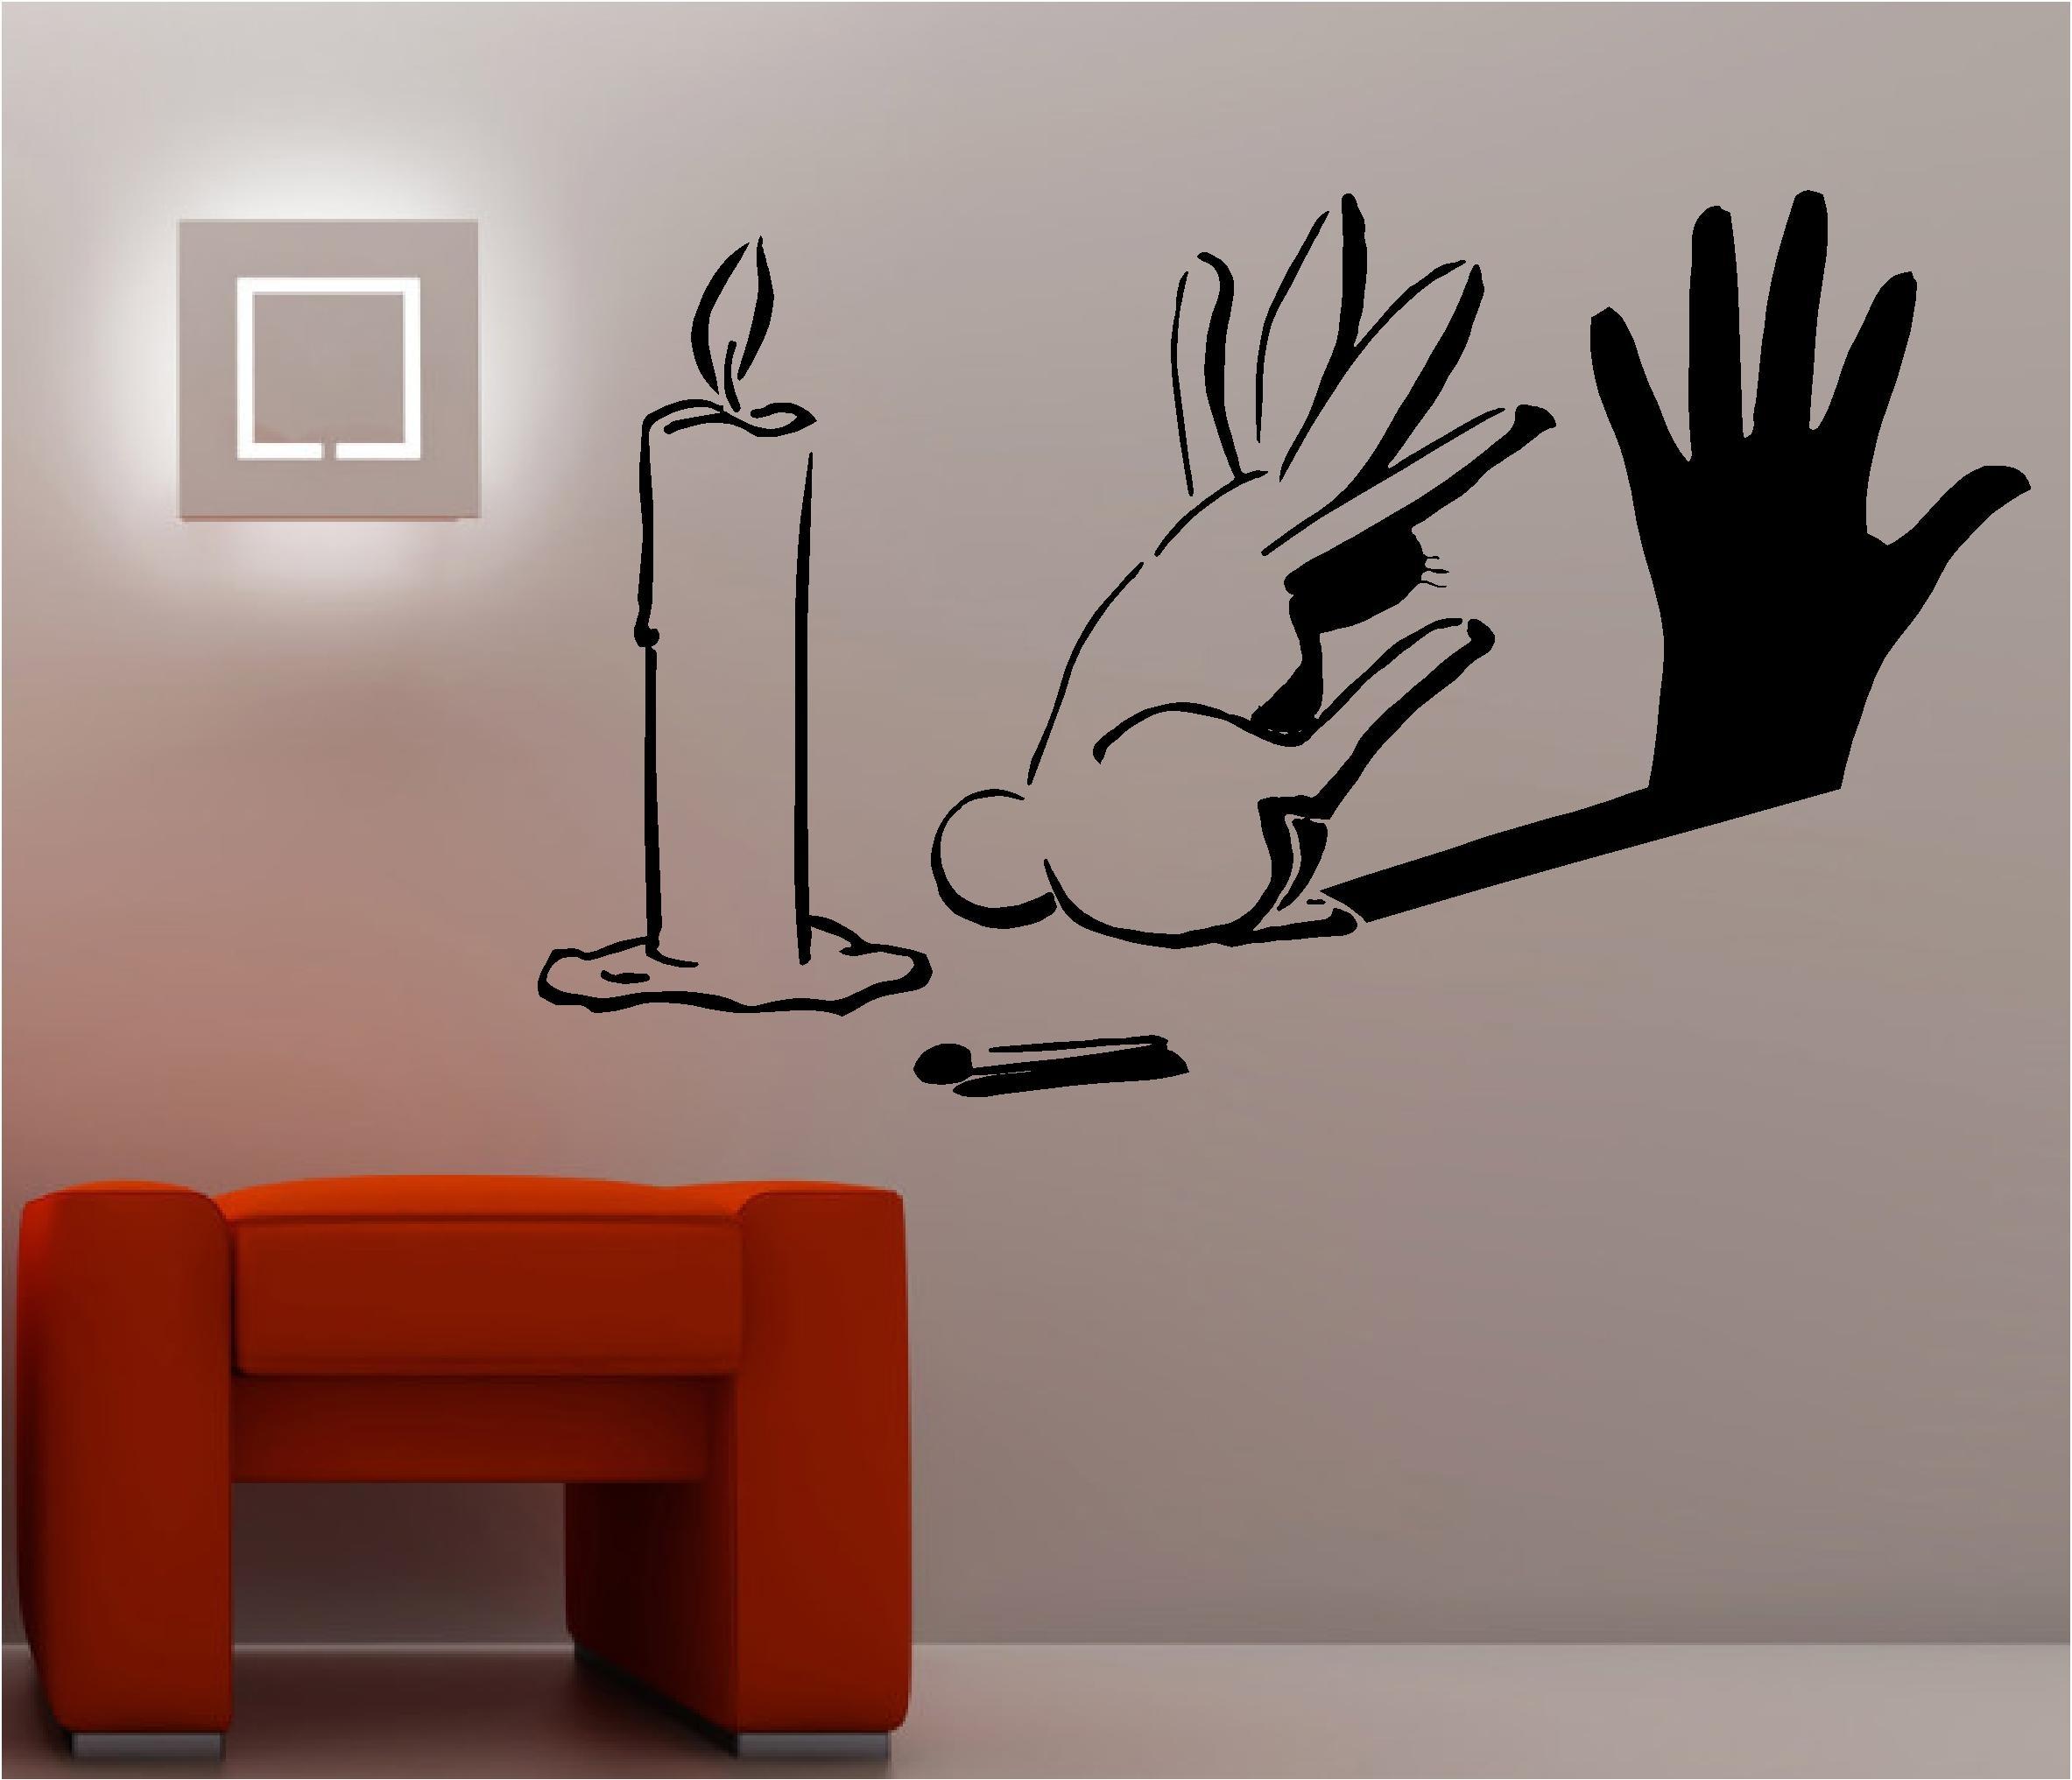 Wall Art Designs: Awesome 10 Wall Art Ideas Cheap Wall Art Ideas Pertaining To Wall Art Designs (View 9 of 20)